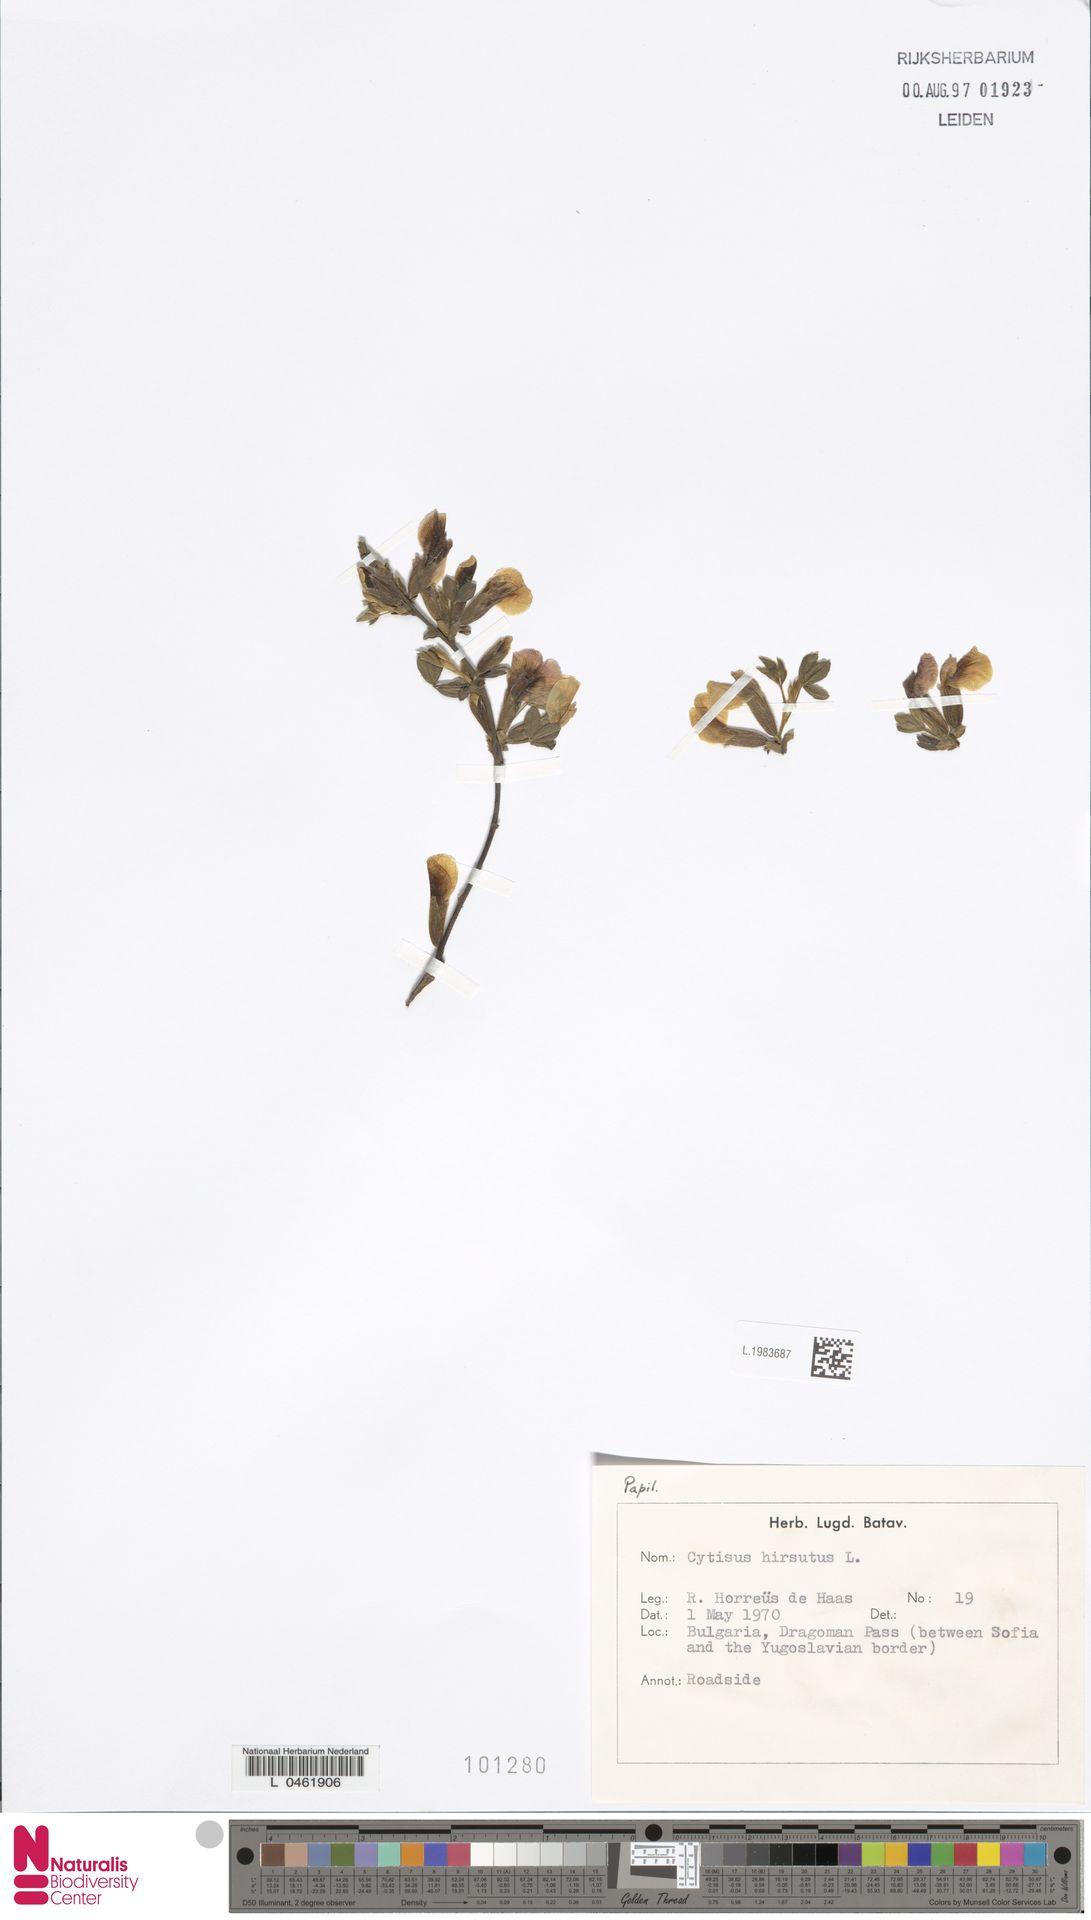 L.1983687 | Cytisus hirsutus L.